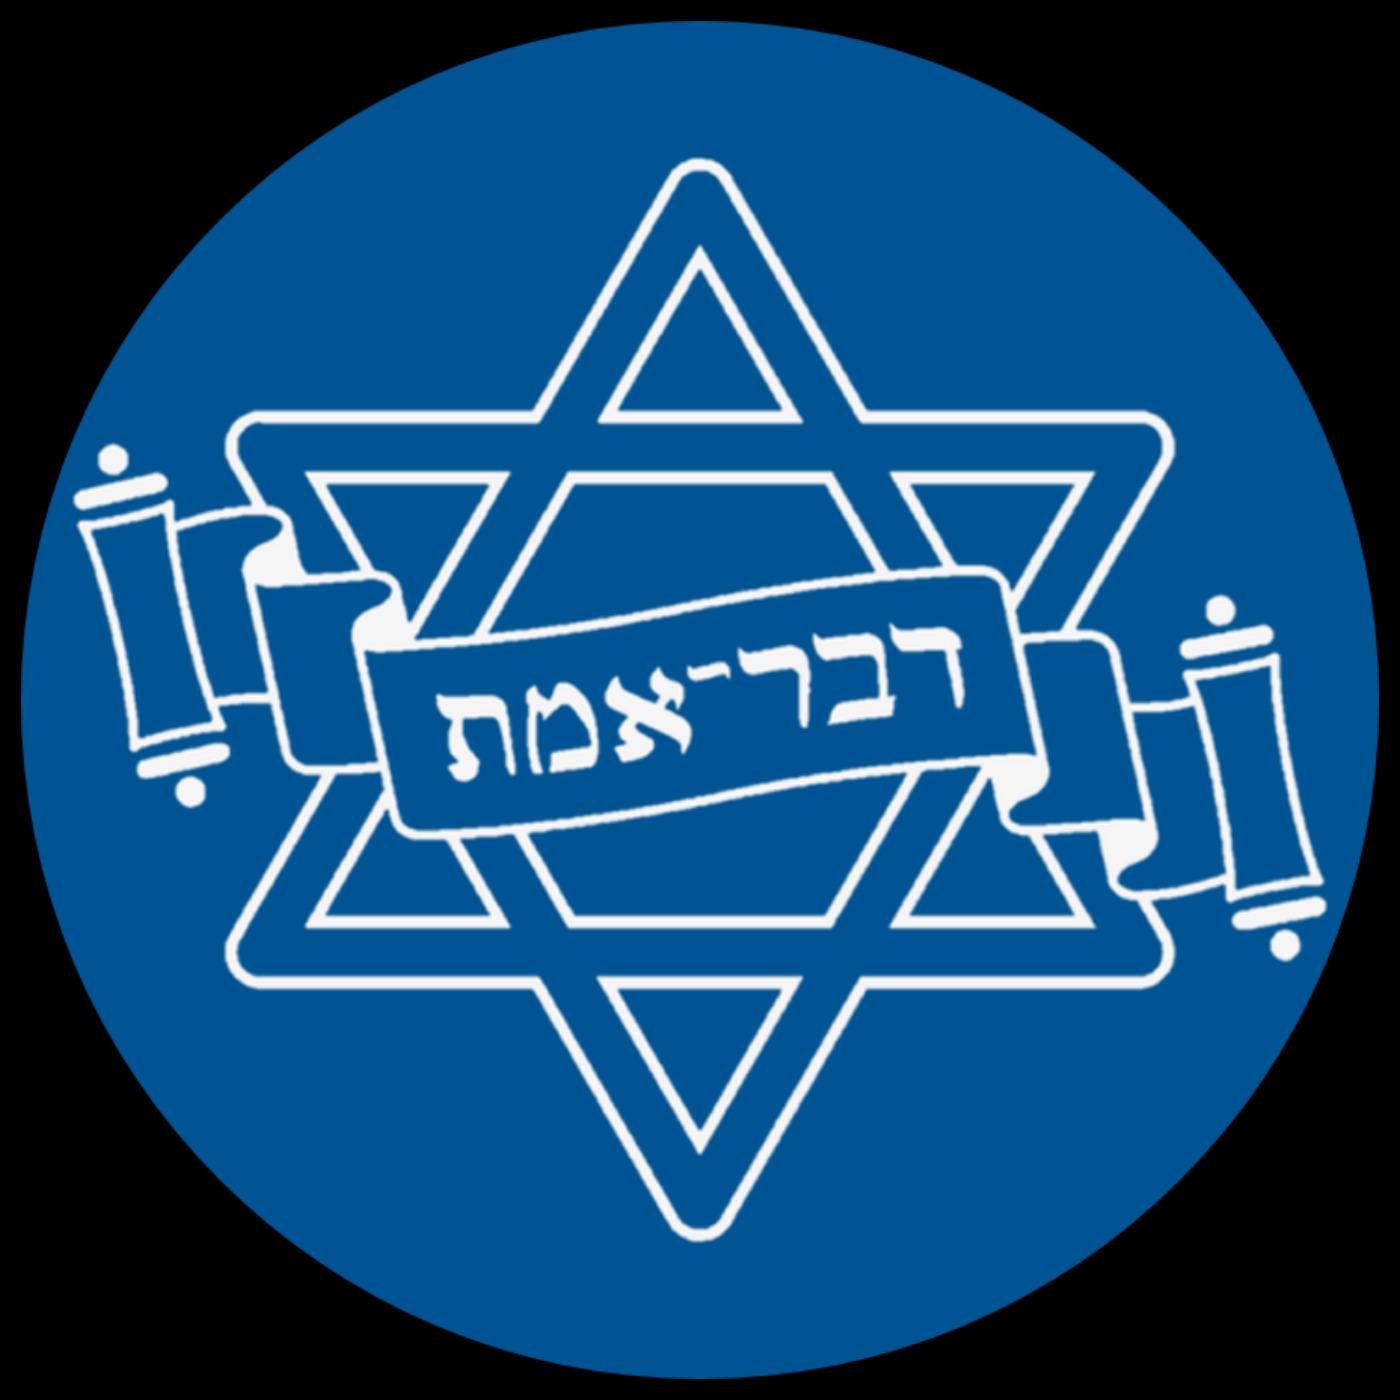 Podfanatic Podcast Devar Emet Messianic Synagogue